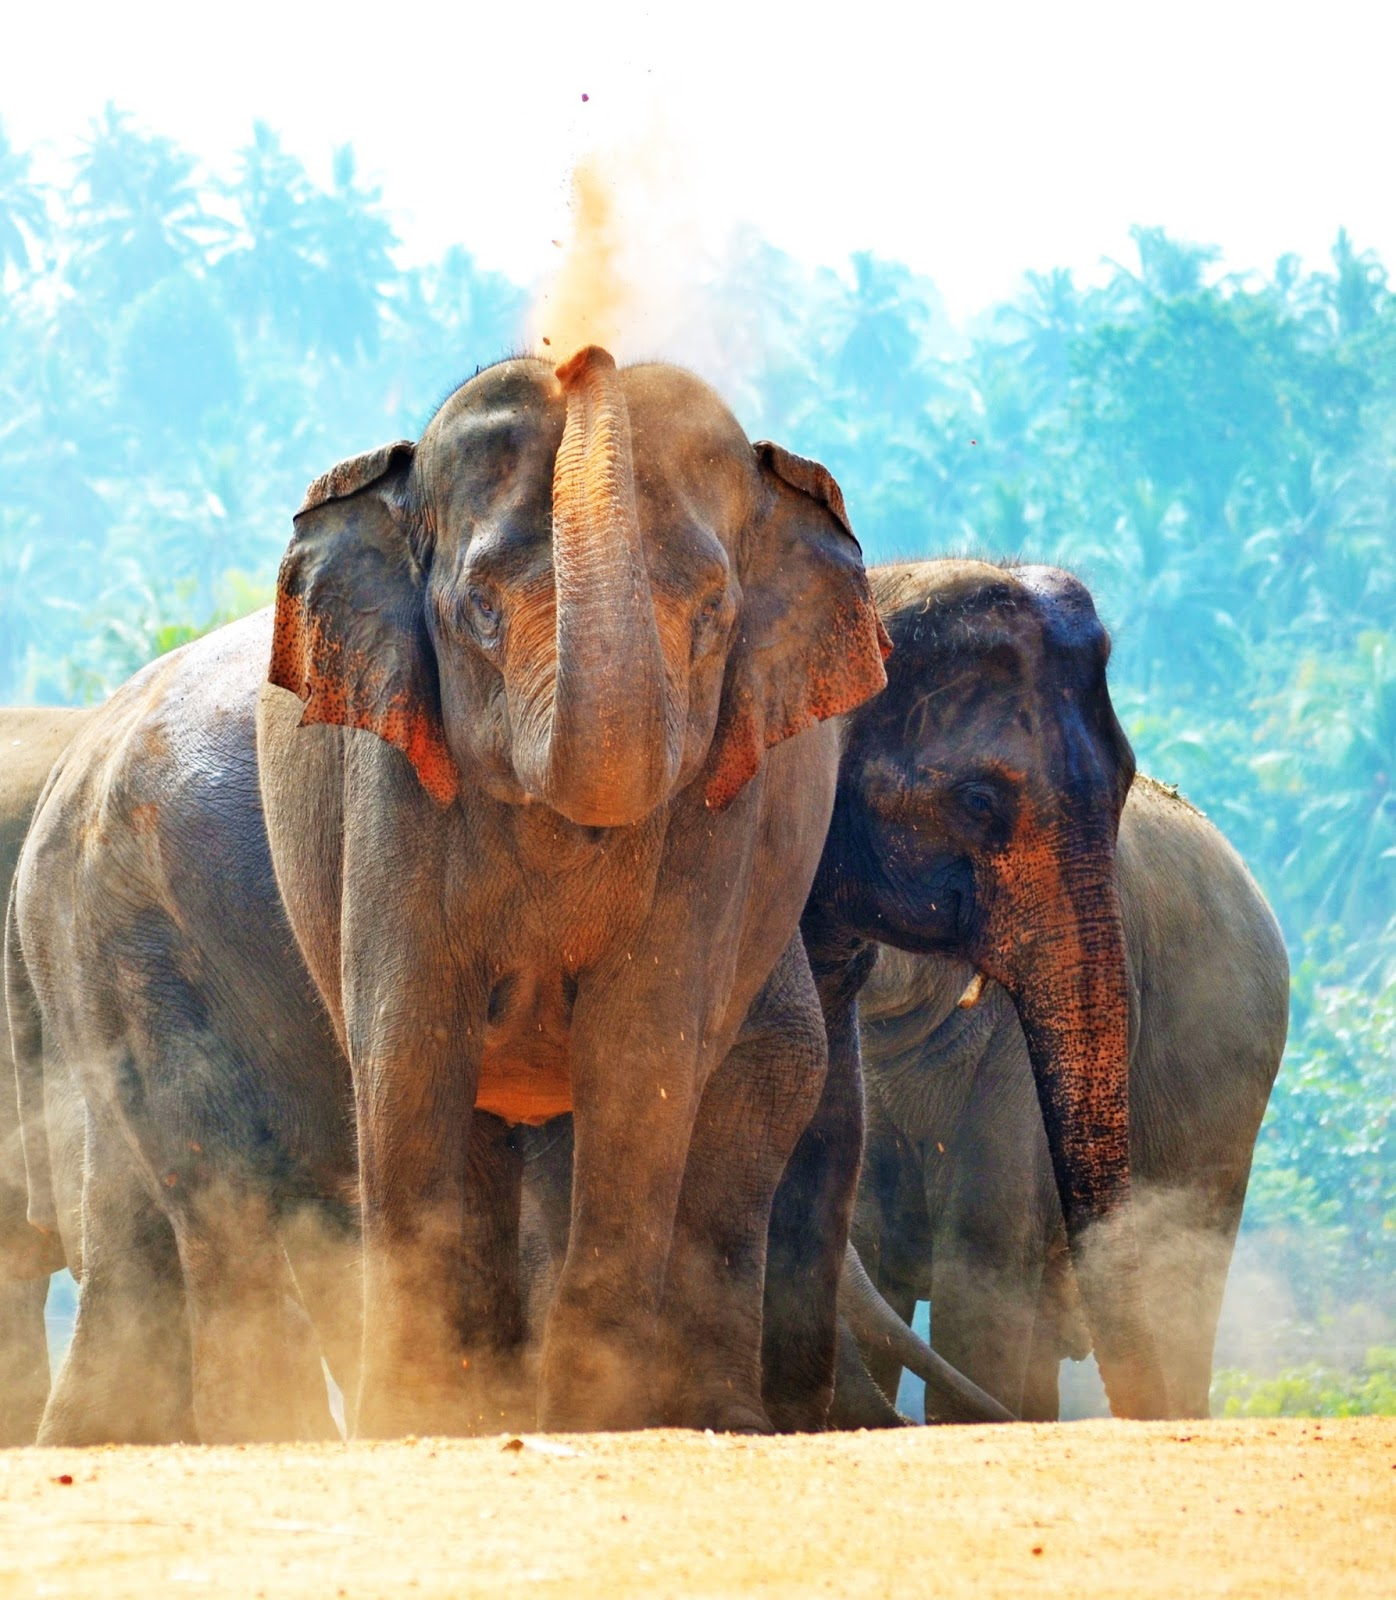 Elephant sand bath.